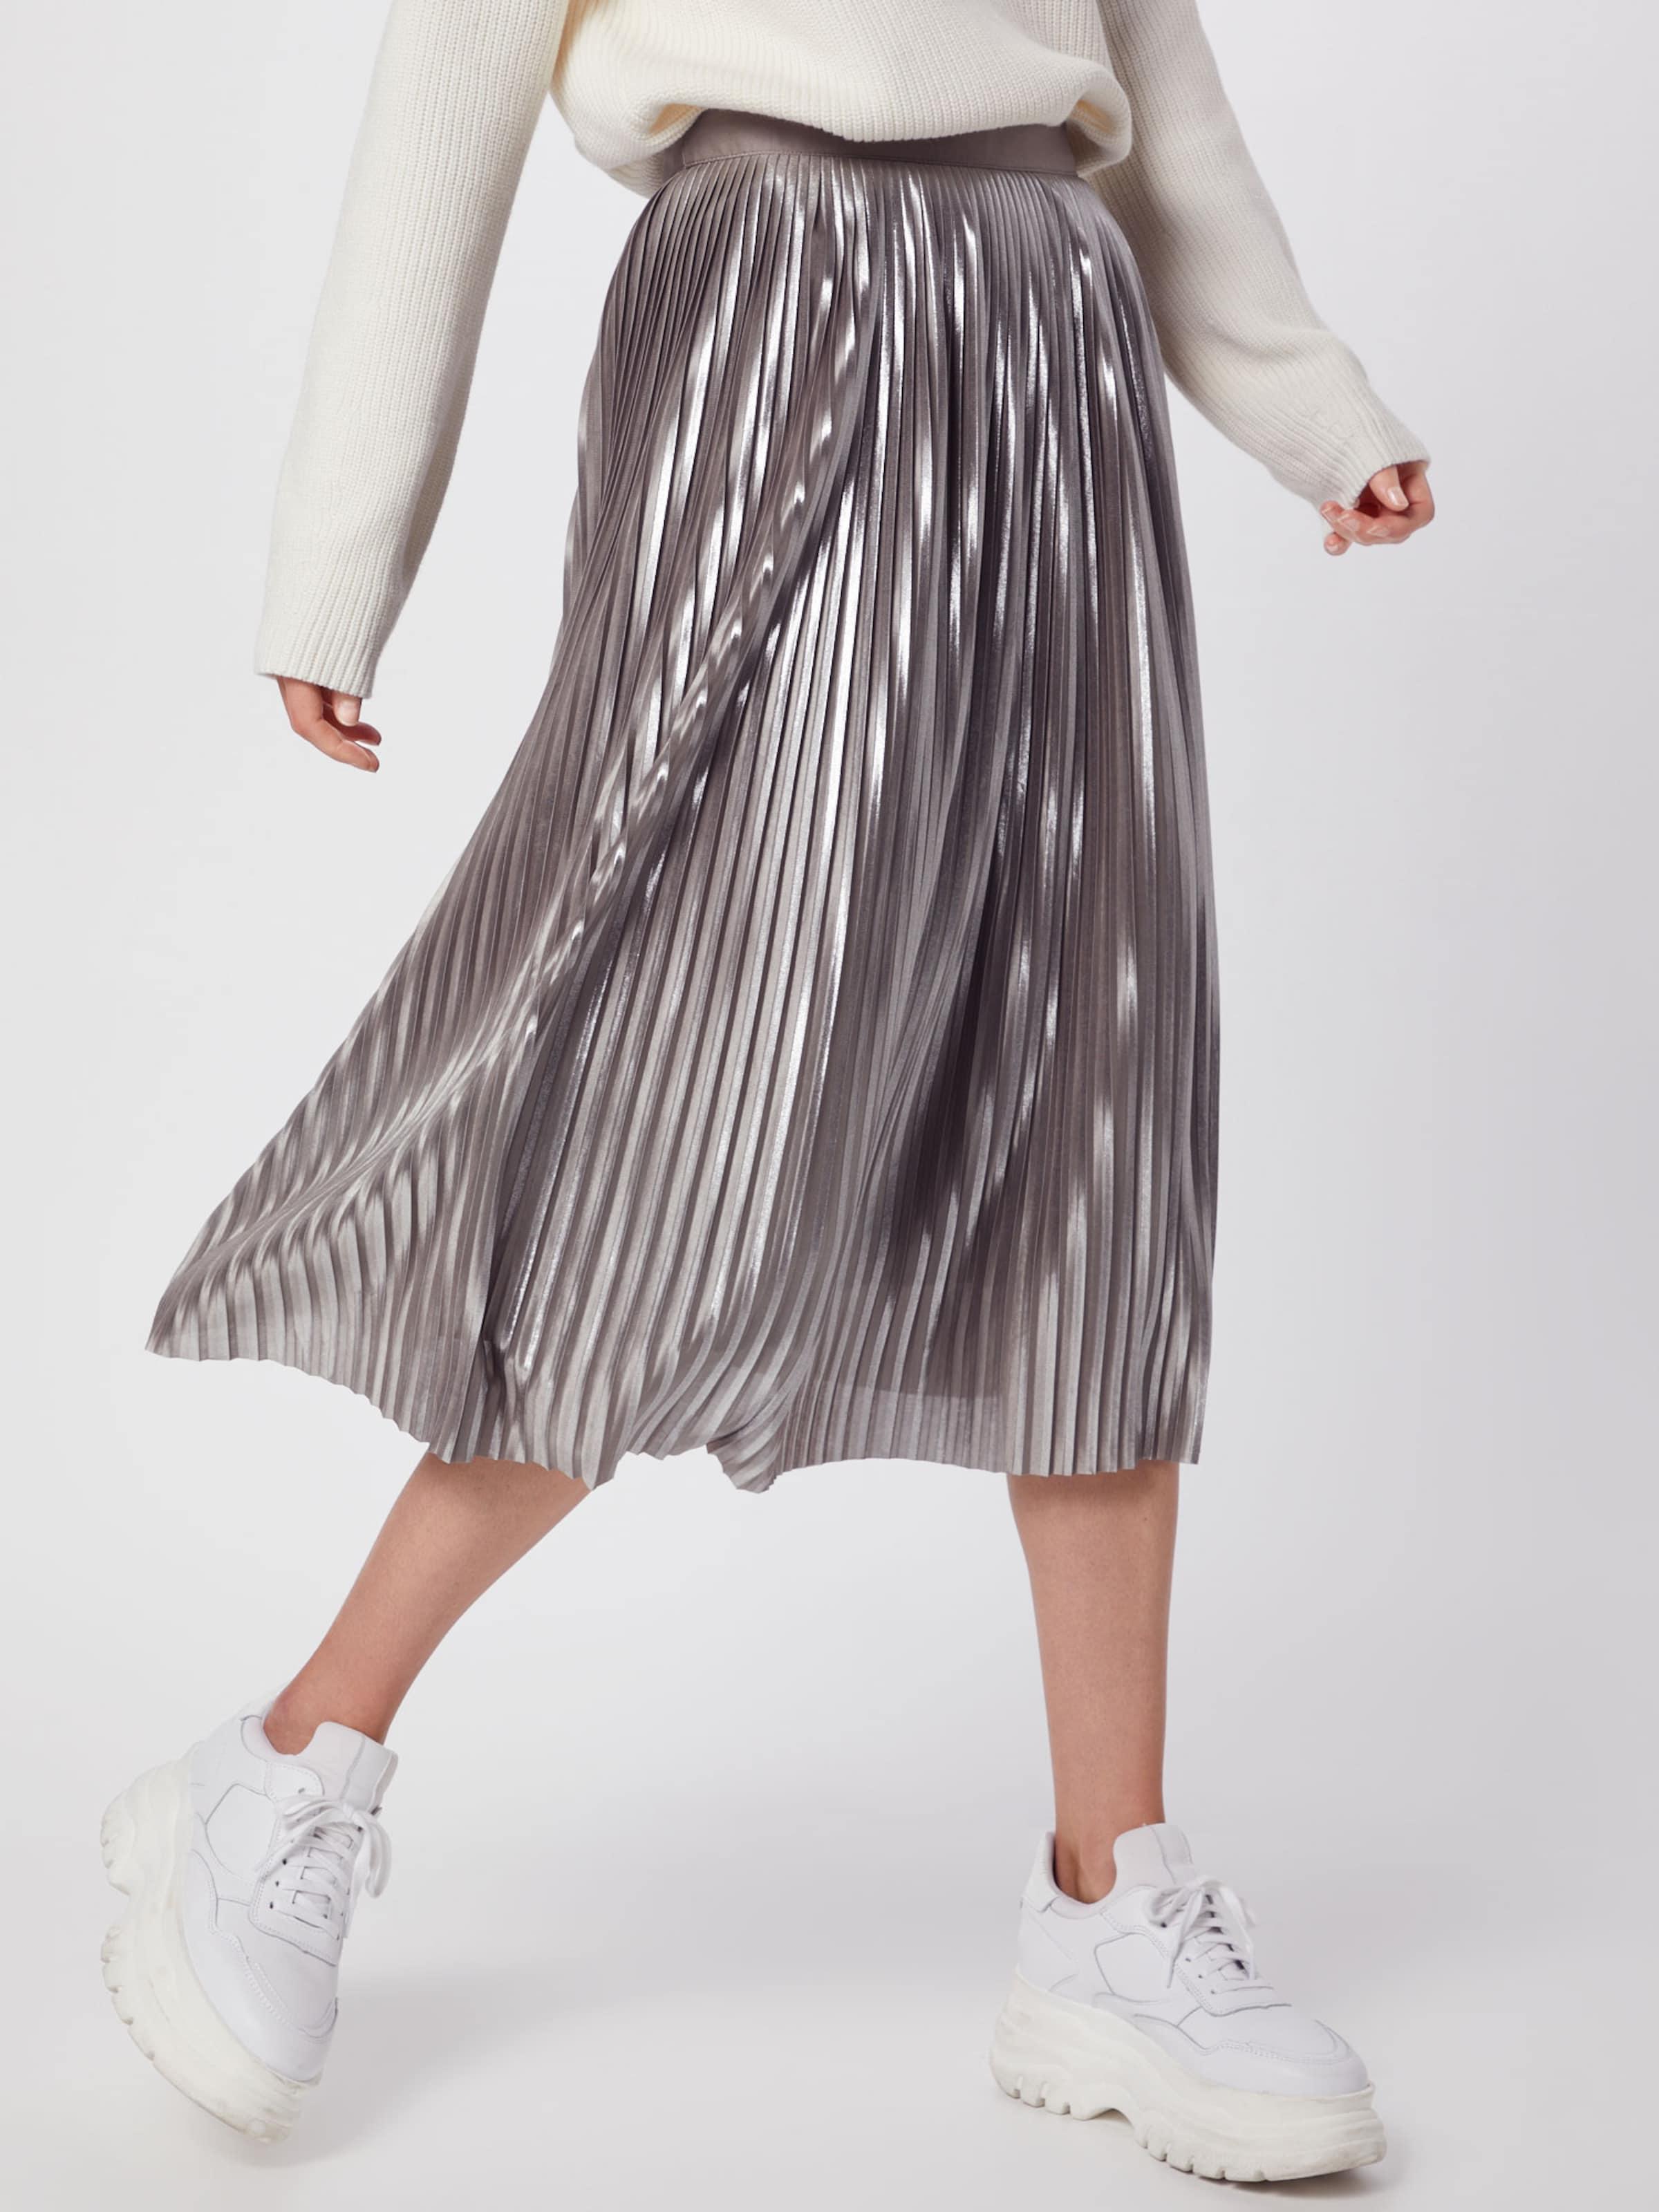 RoséSilber 'pleated Republic Banana Metallic Skirt' Rock In I2EDWH9Y